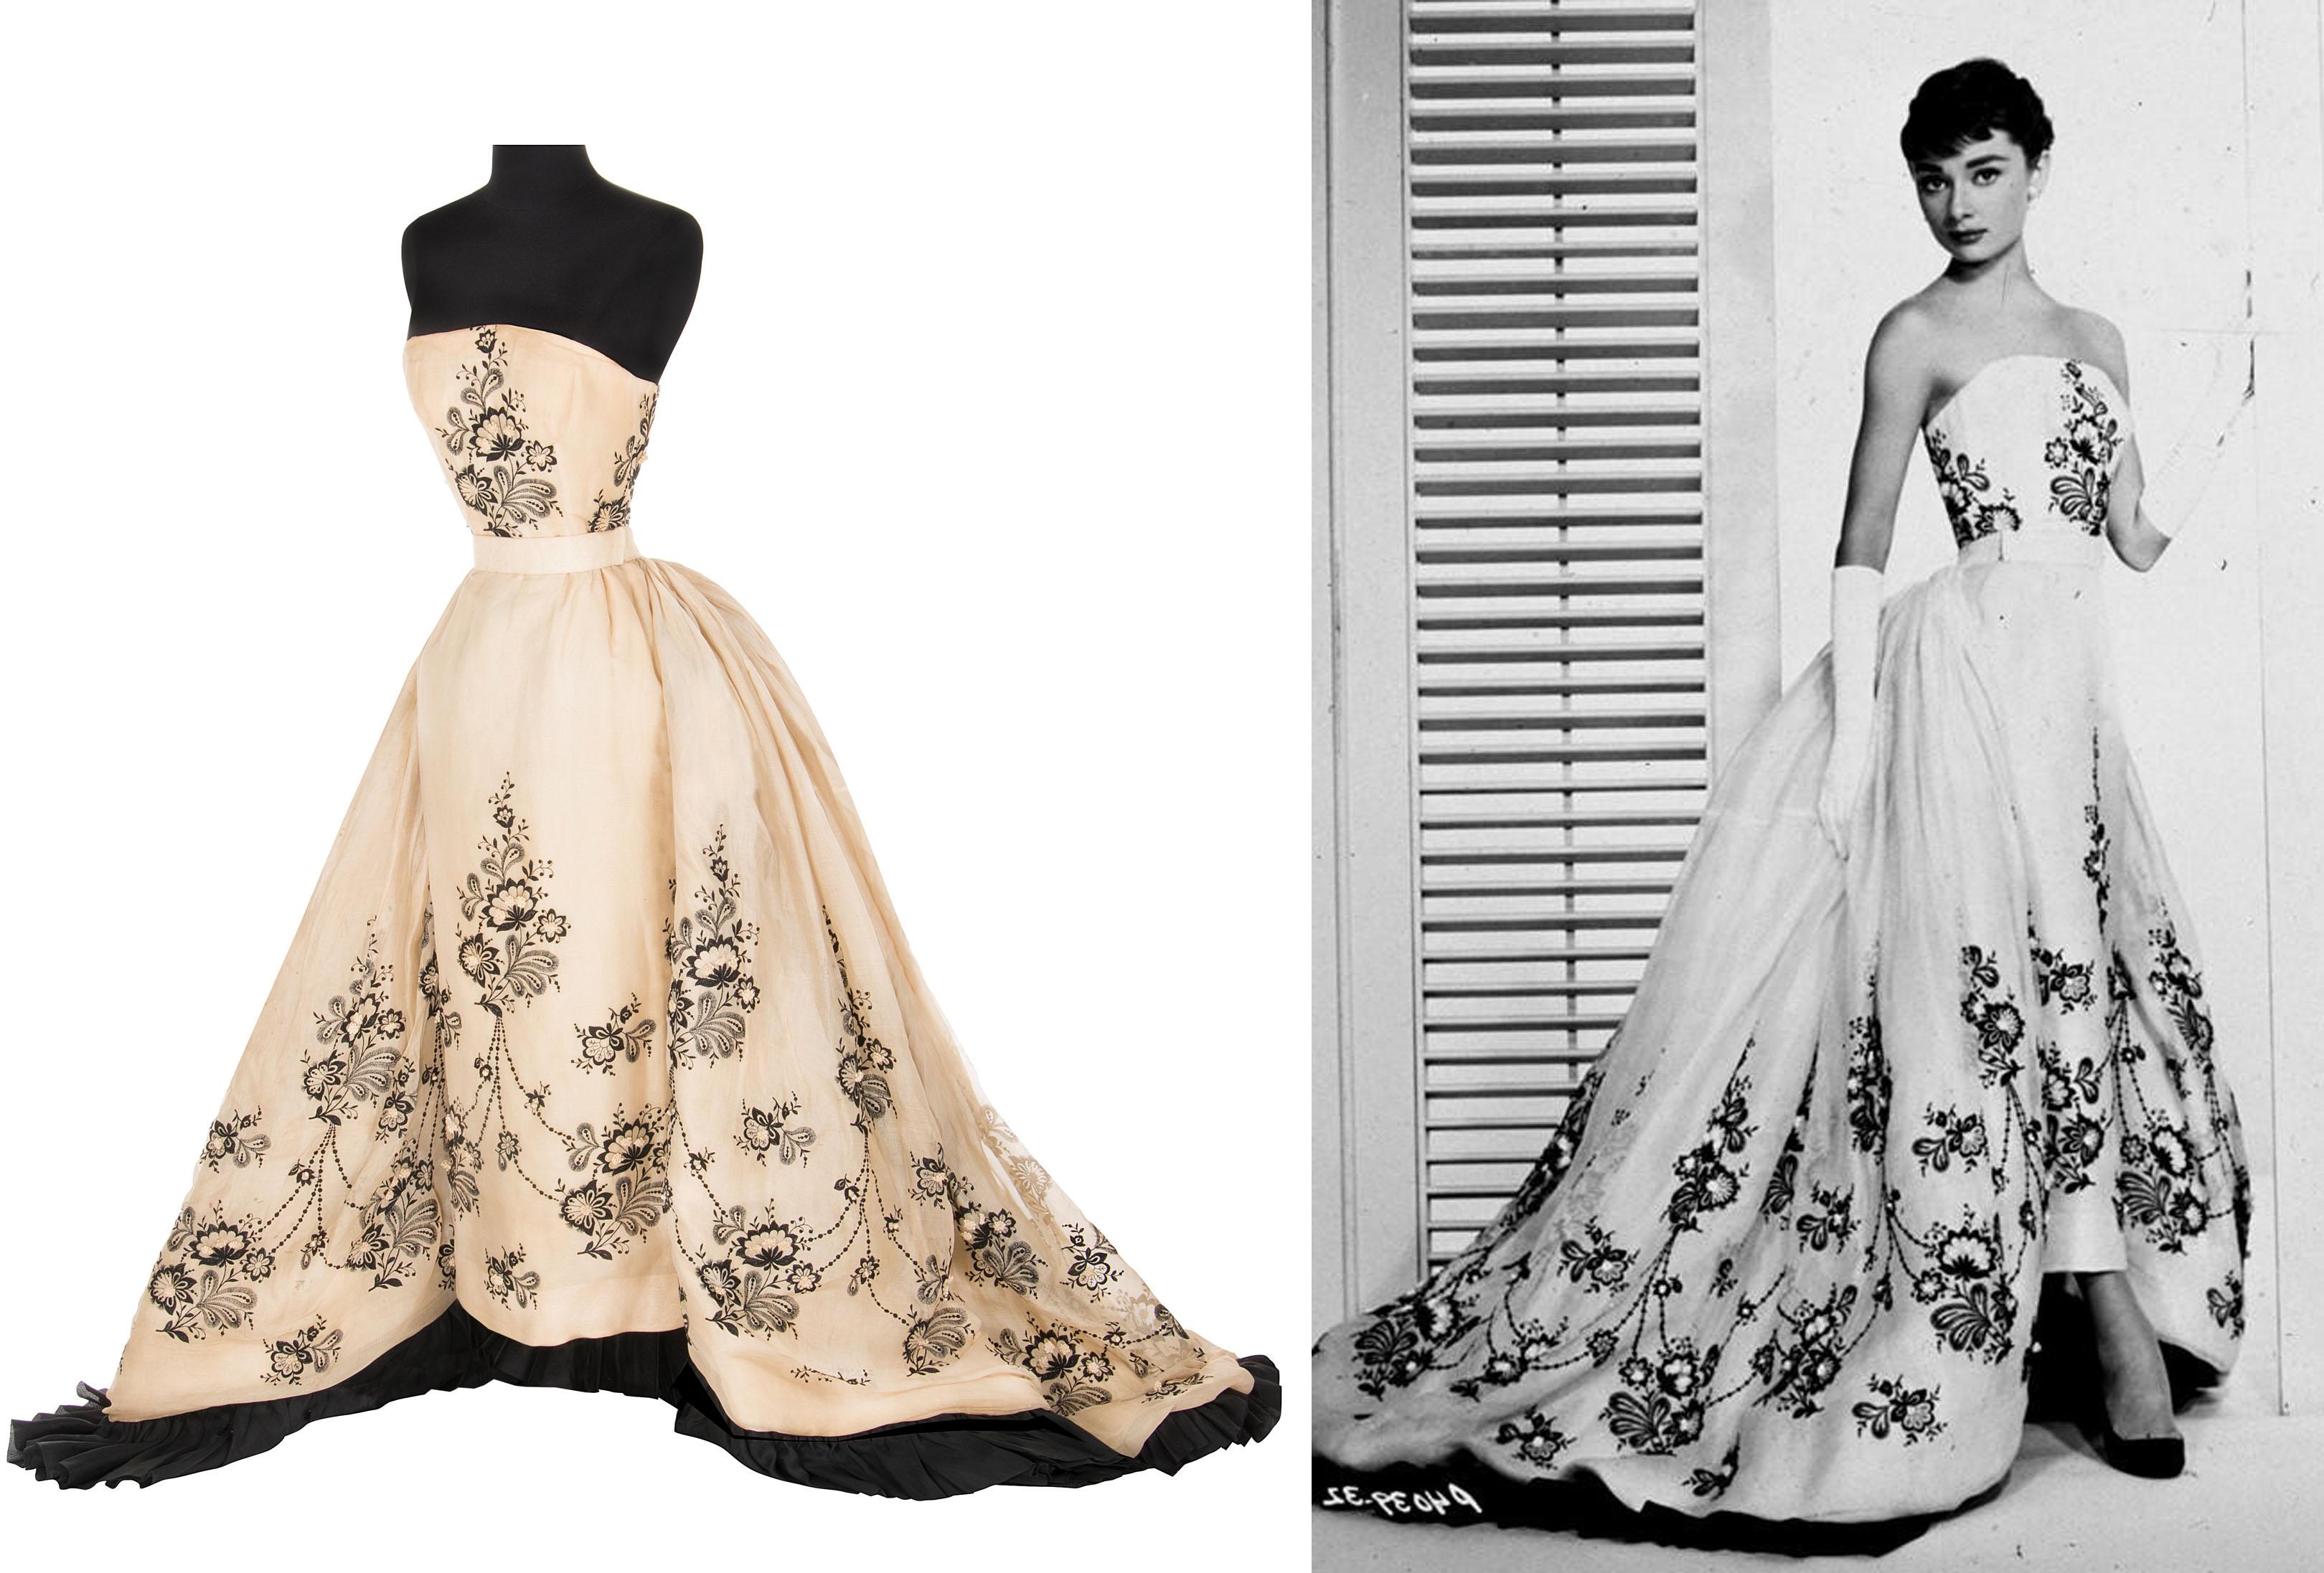 Black Color In Fashion History